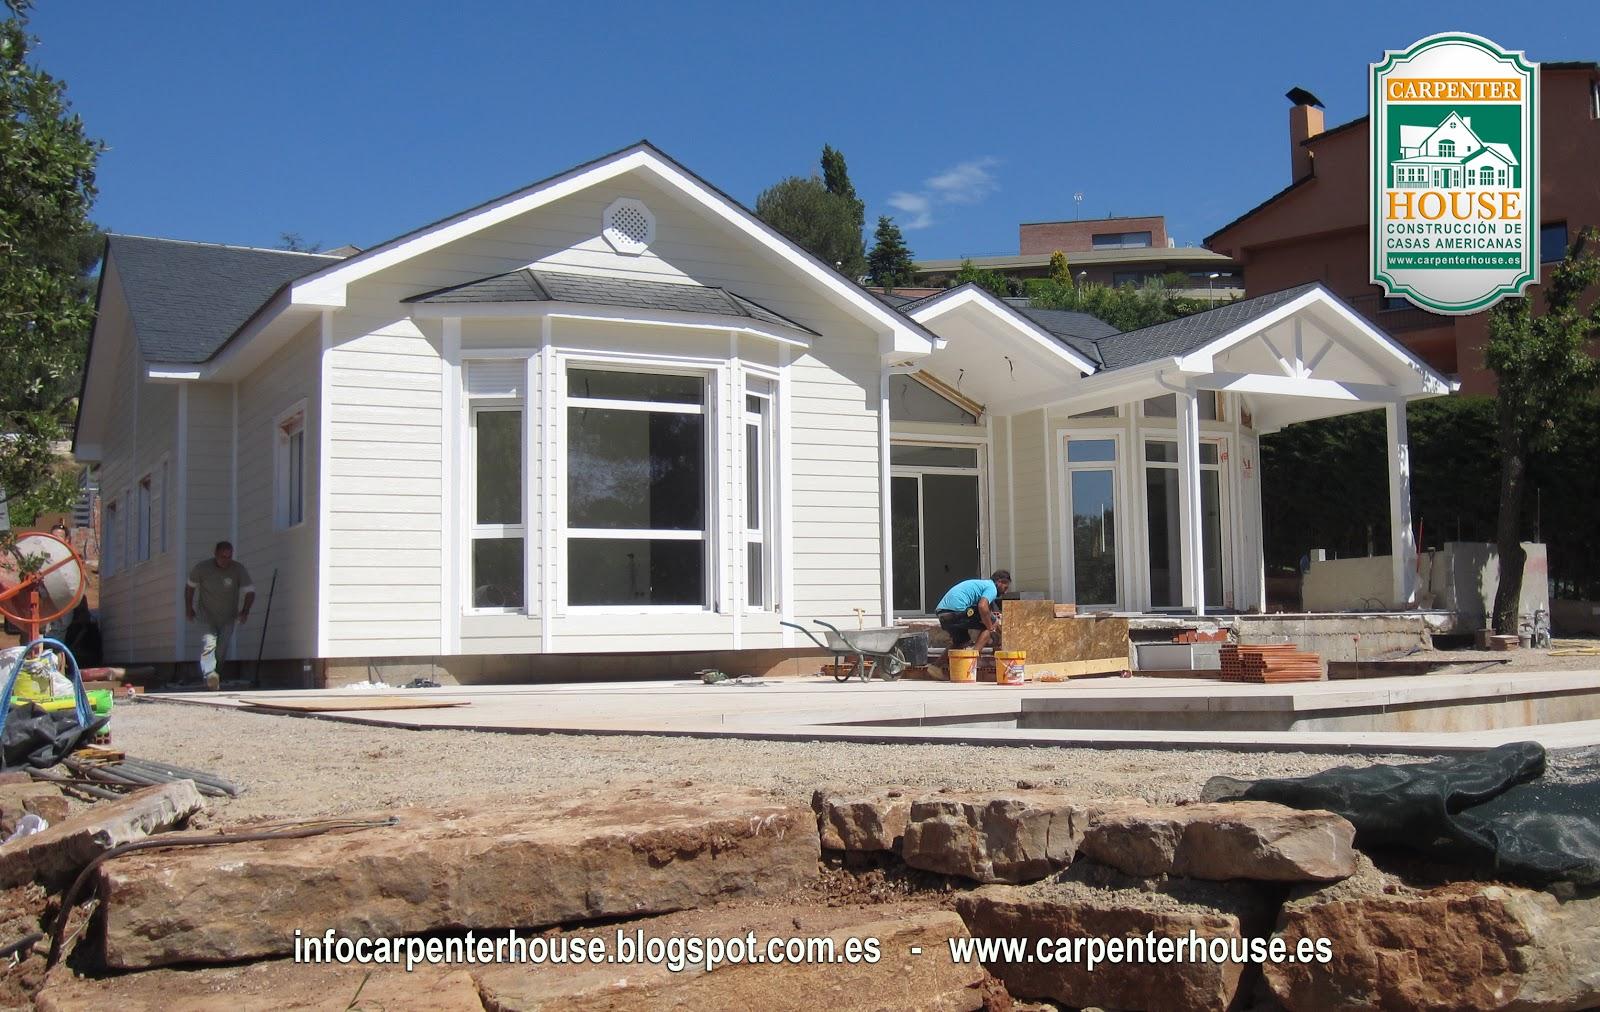 6 fase construcci n casa en el vall s occidental - Casas en el valles occidental ...